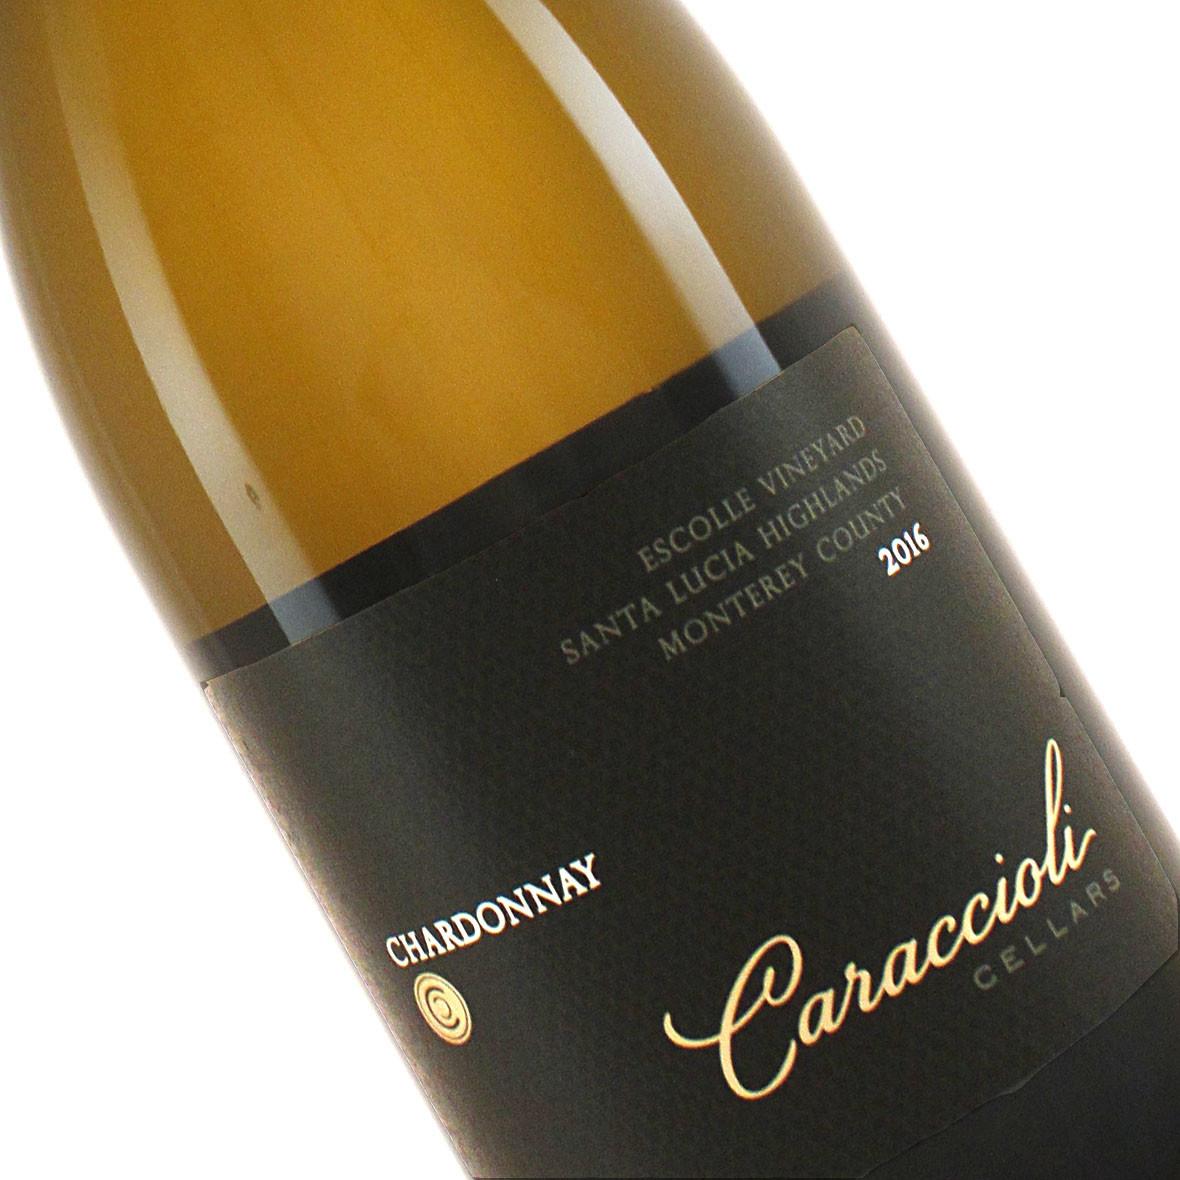 Caraccioli Cellars 2016 Chardonnay Santa Lucia Highlands, Monterey County